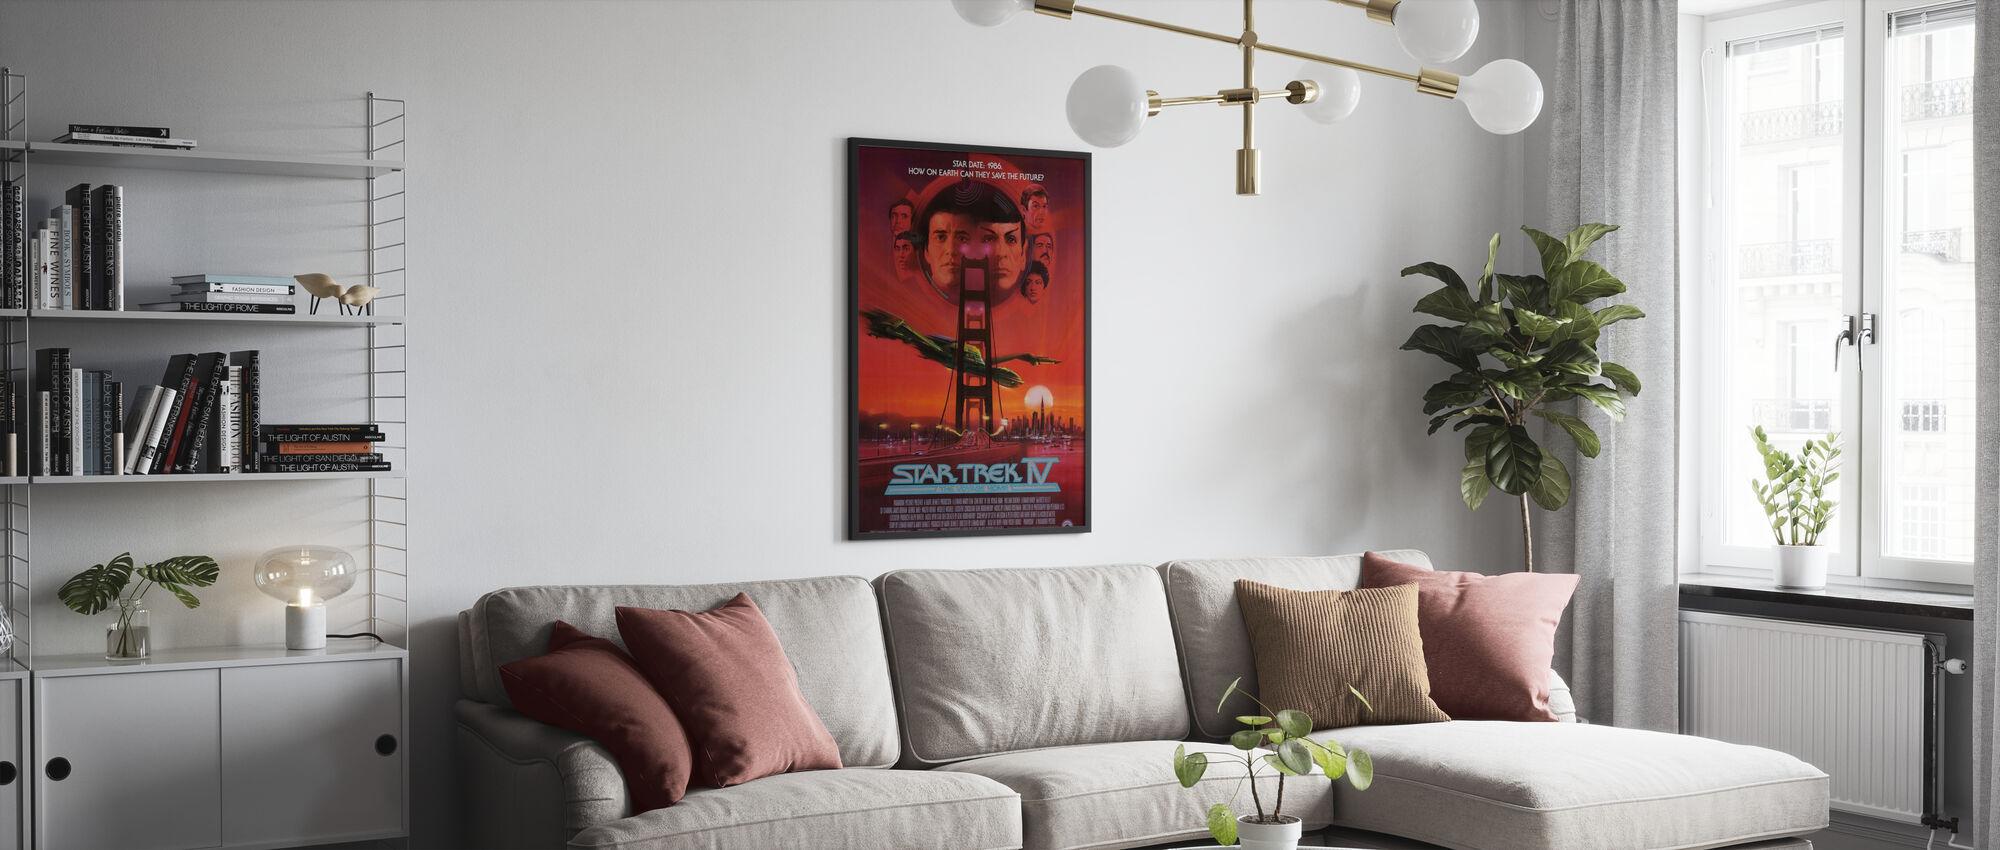 Star Trek IV de reis naar huis - Poster - Woonkamer